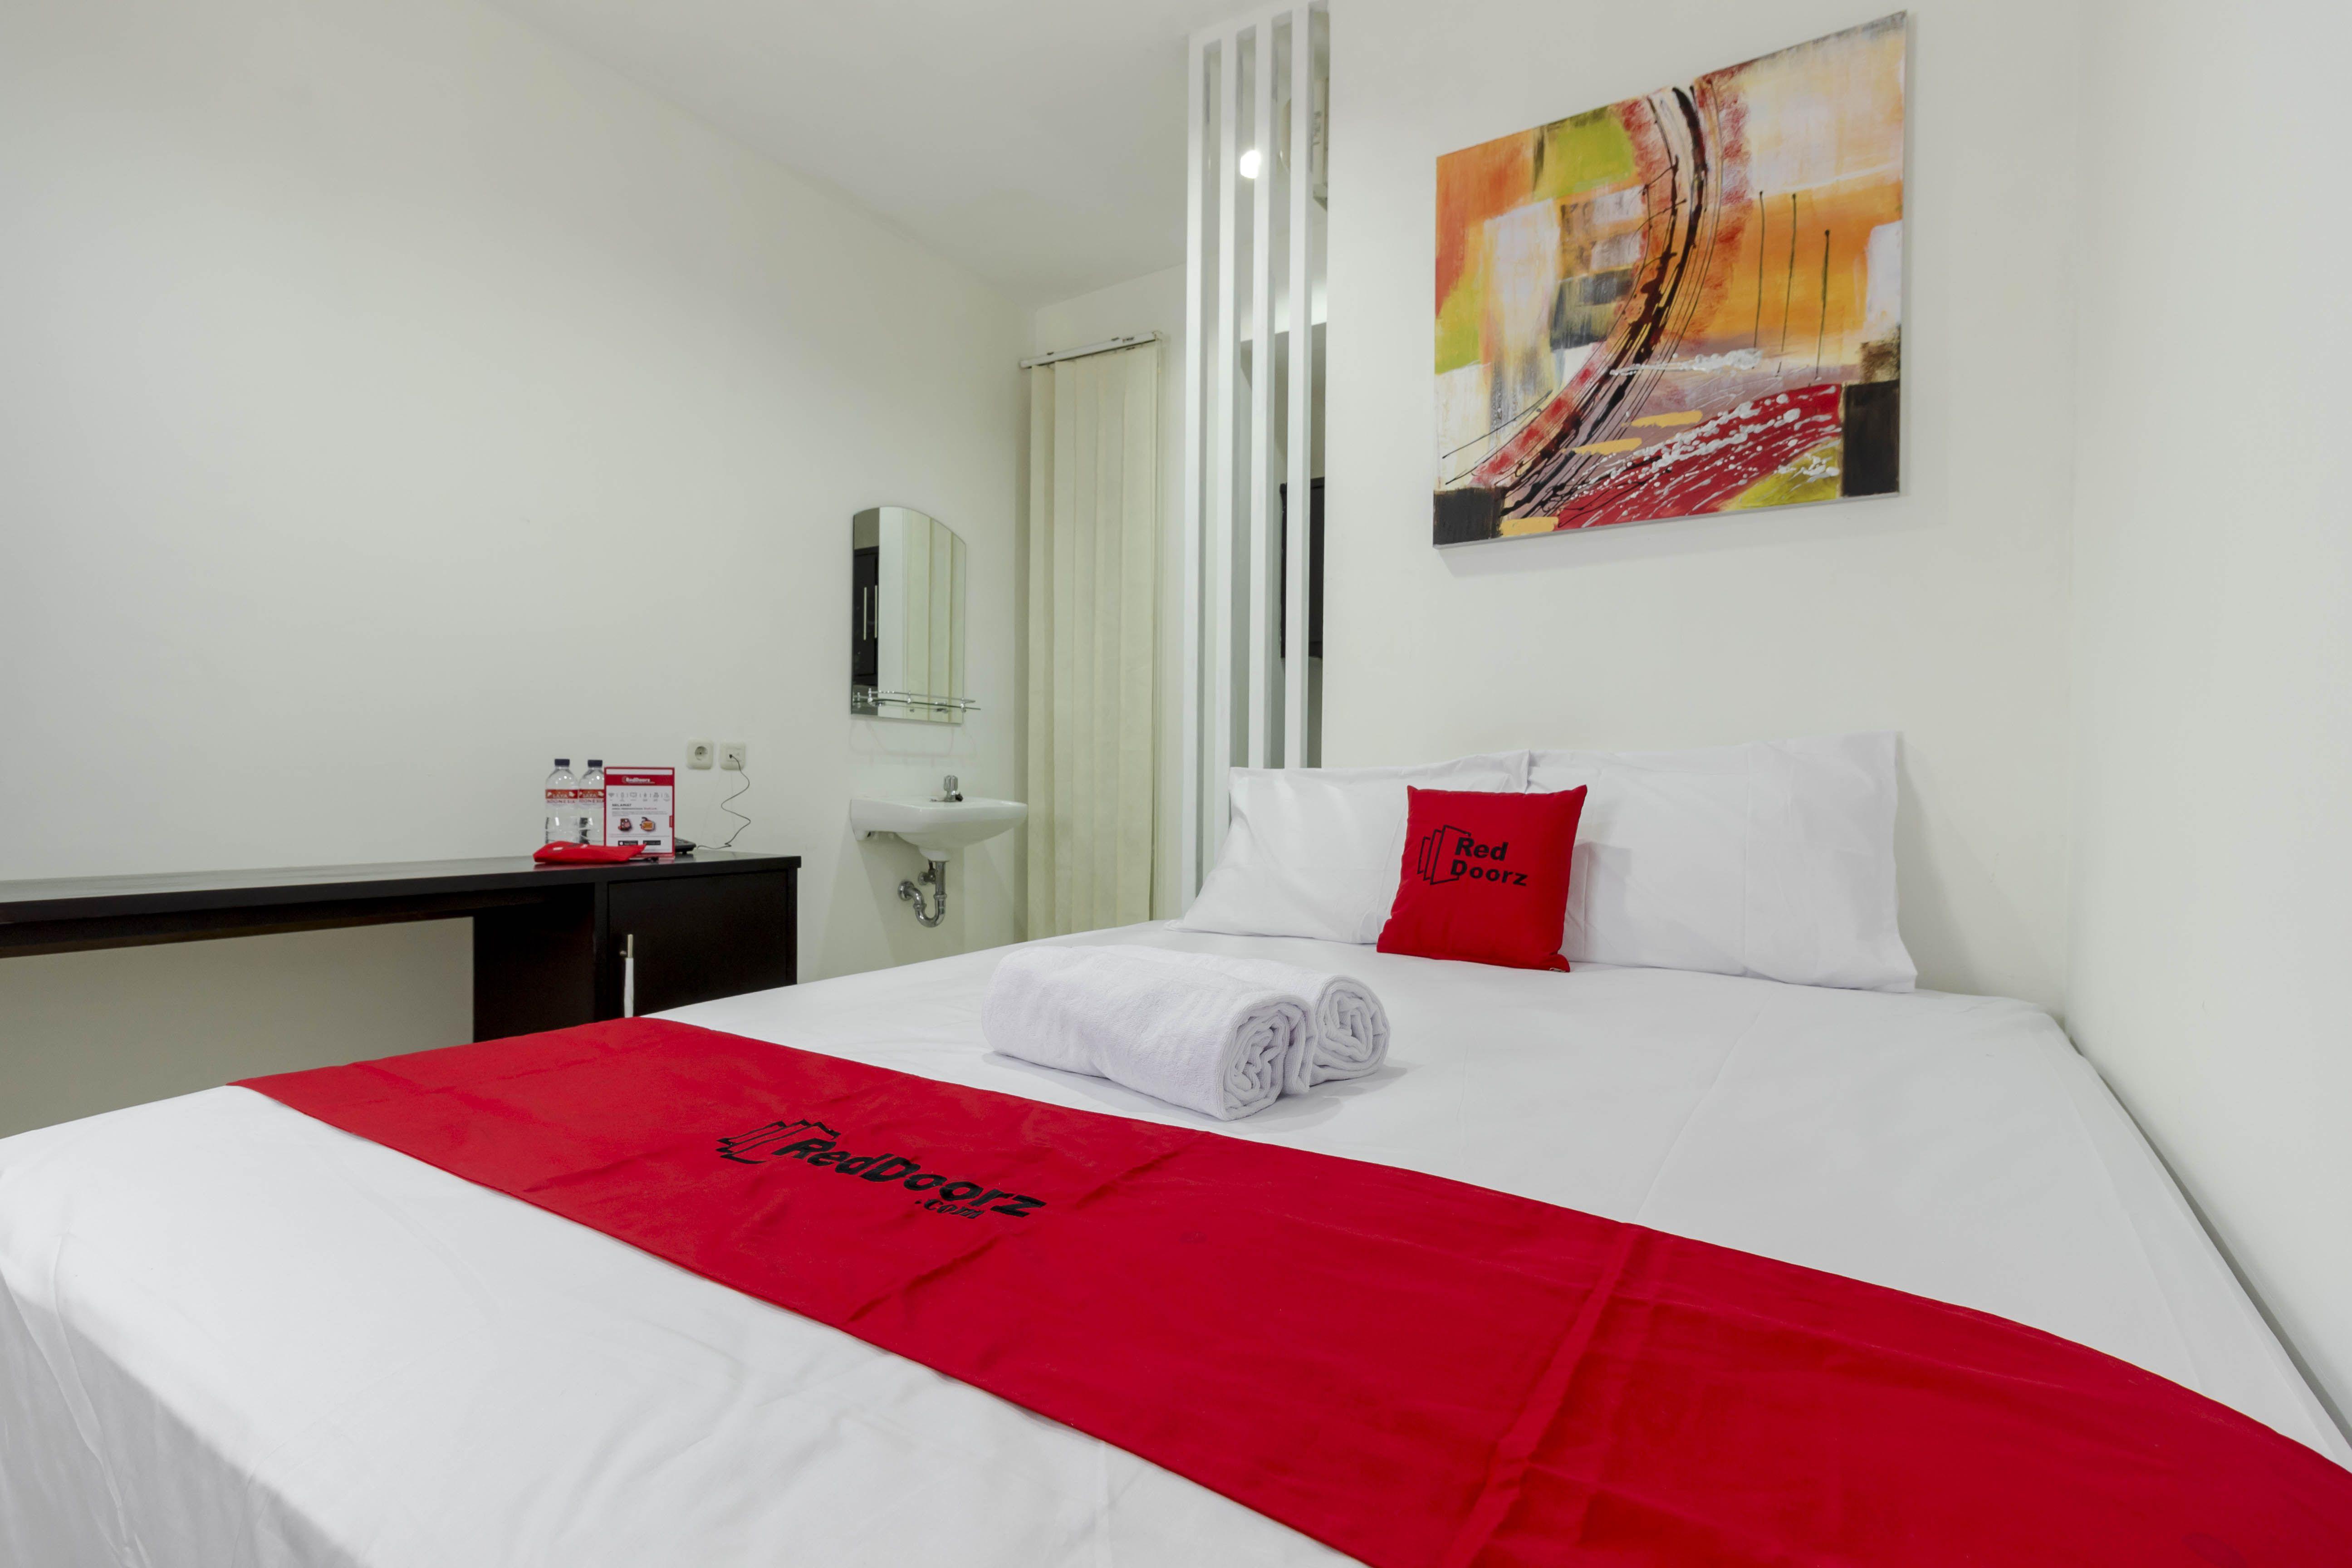 Hotels In Sawah Besar Book Promo Hotel Central Jakarta Voucher Best Western Mangga Dua Reddoorz Plus Pasar Baru